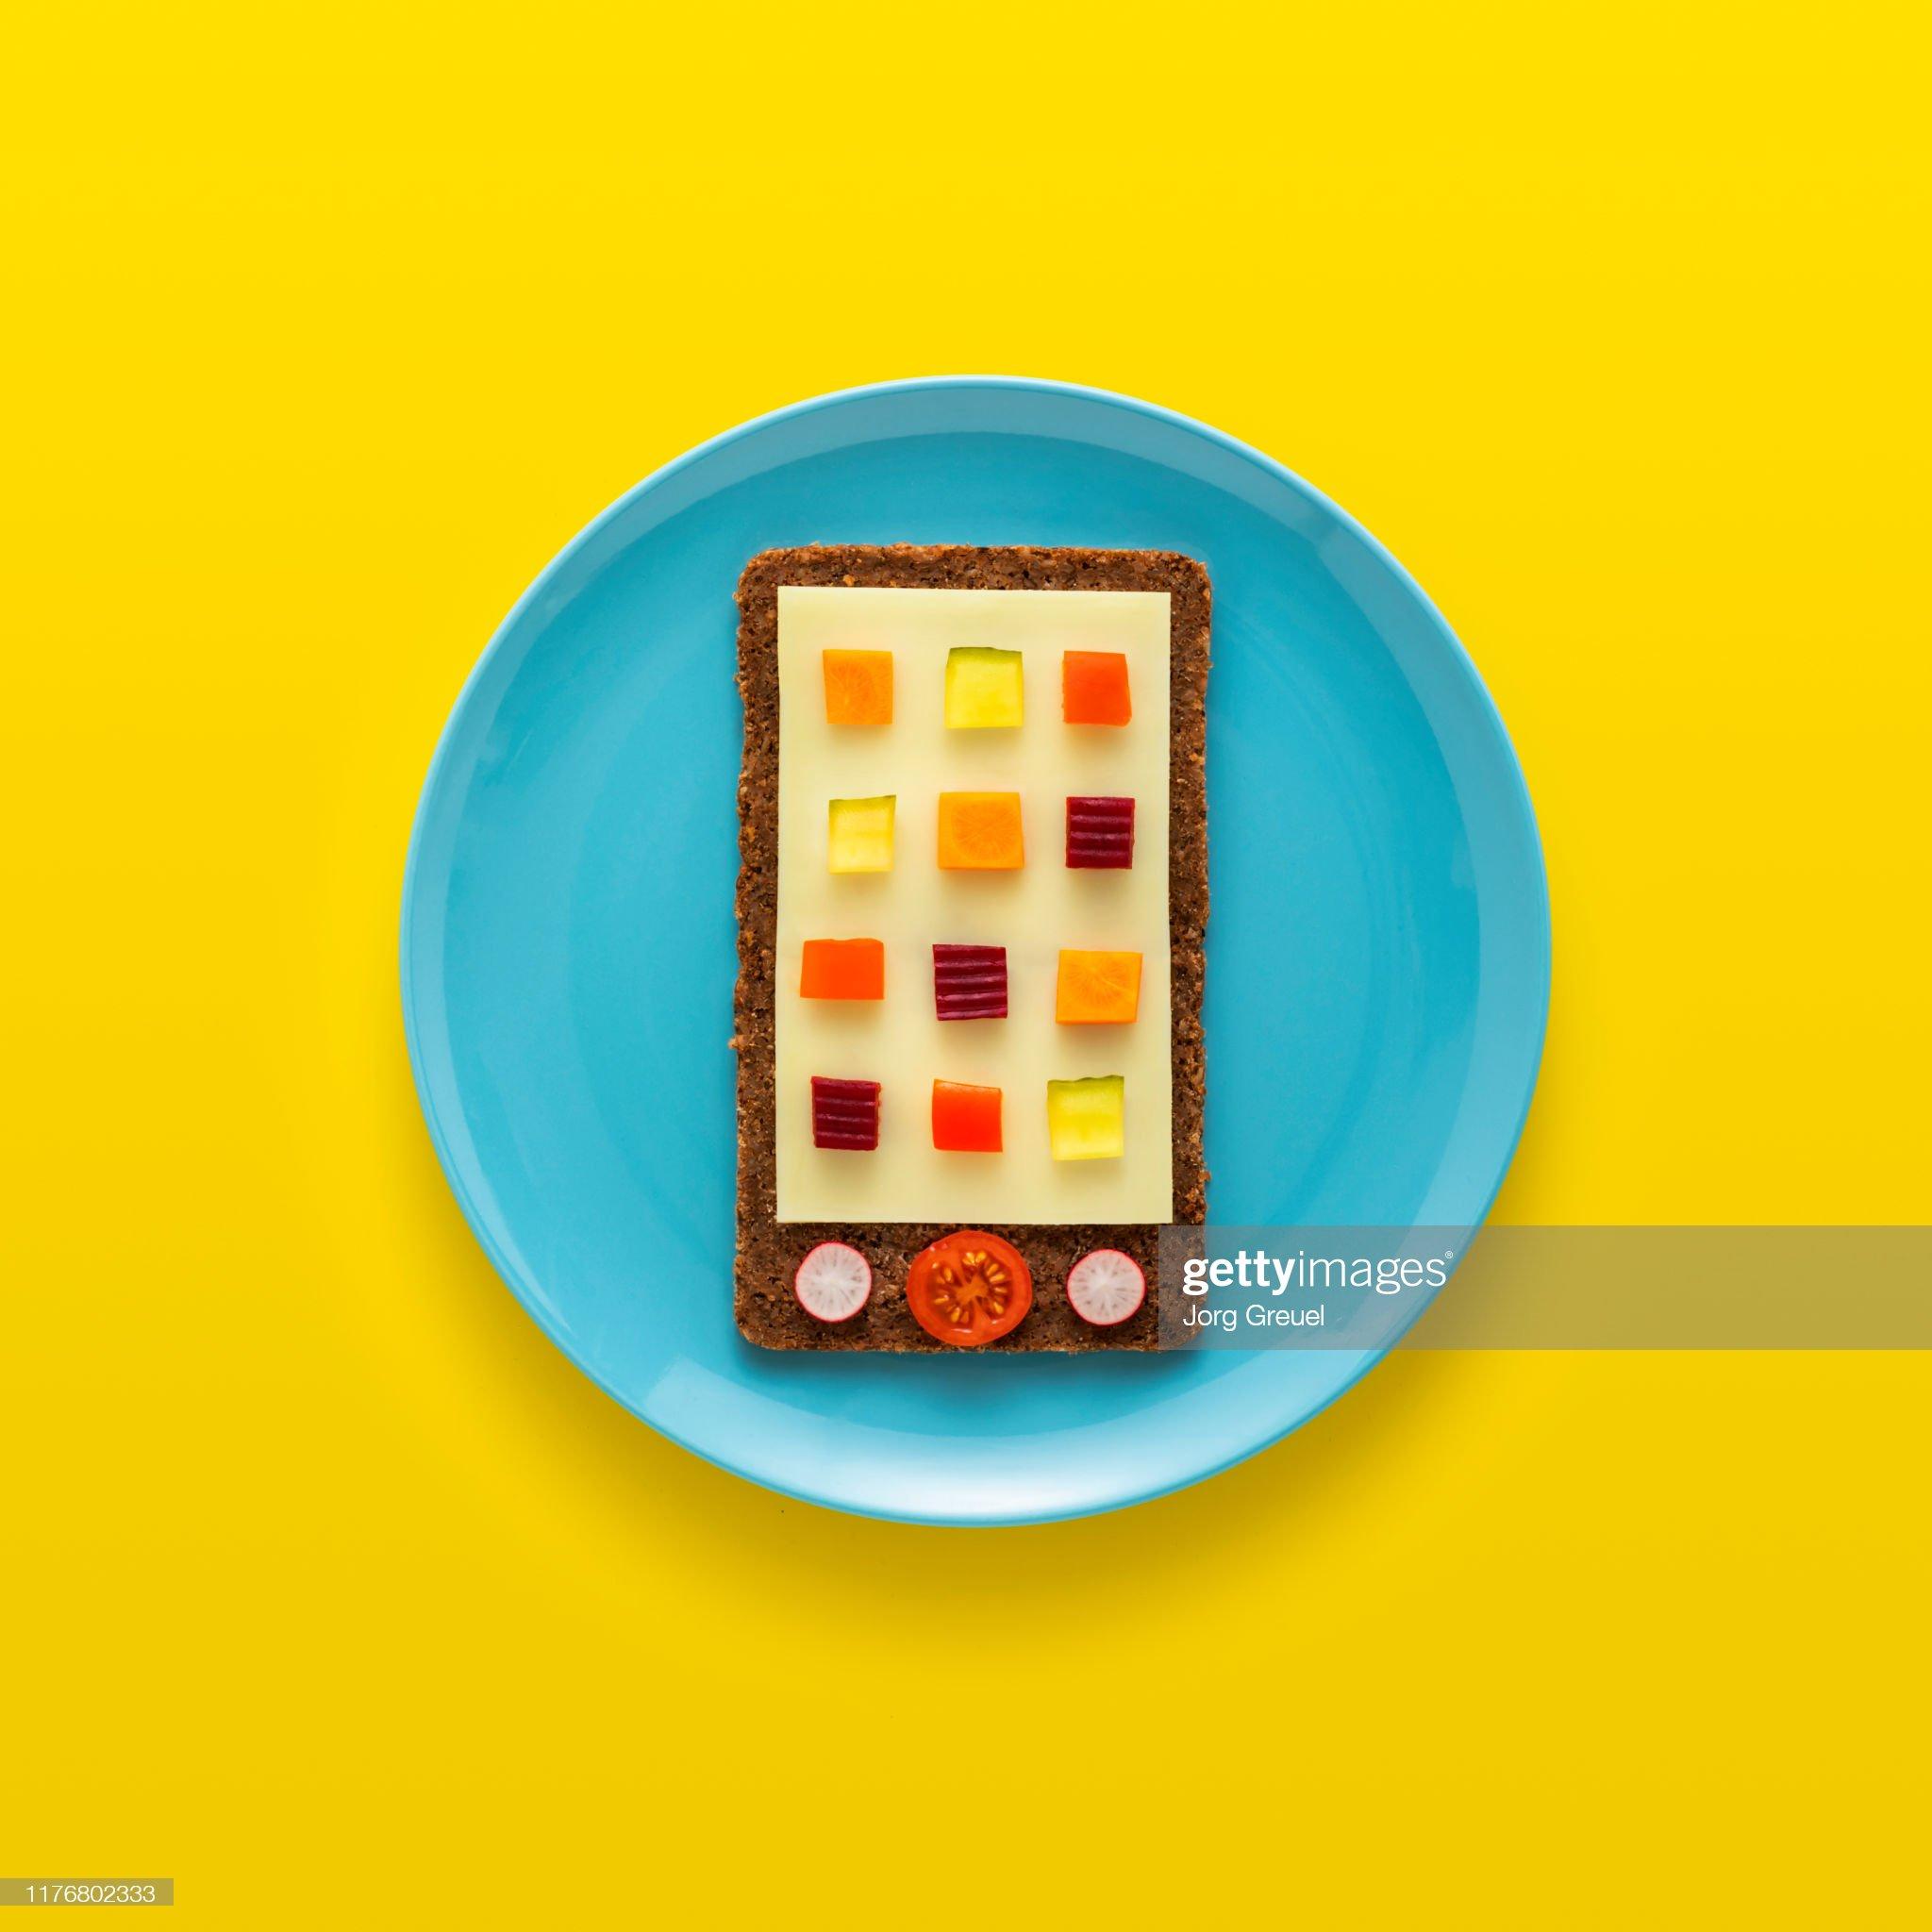 Edible smartphone on plate : Stock Photo